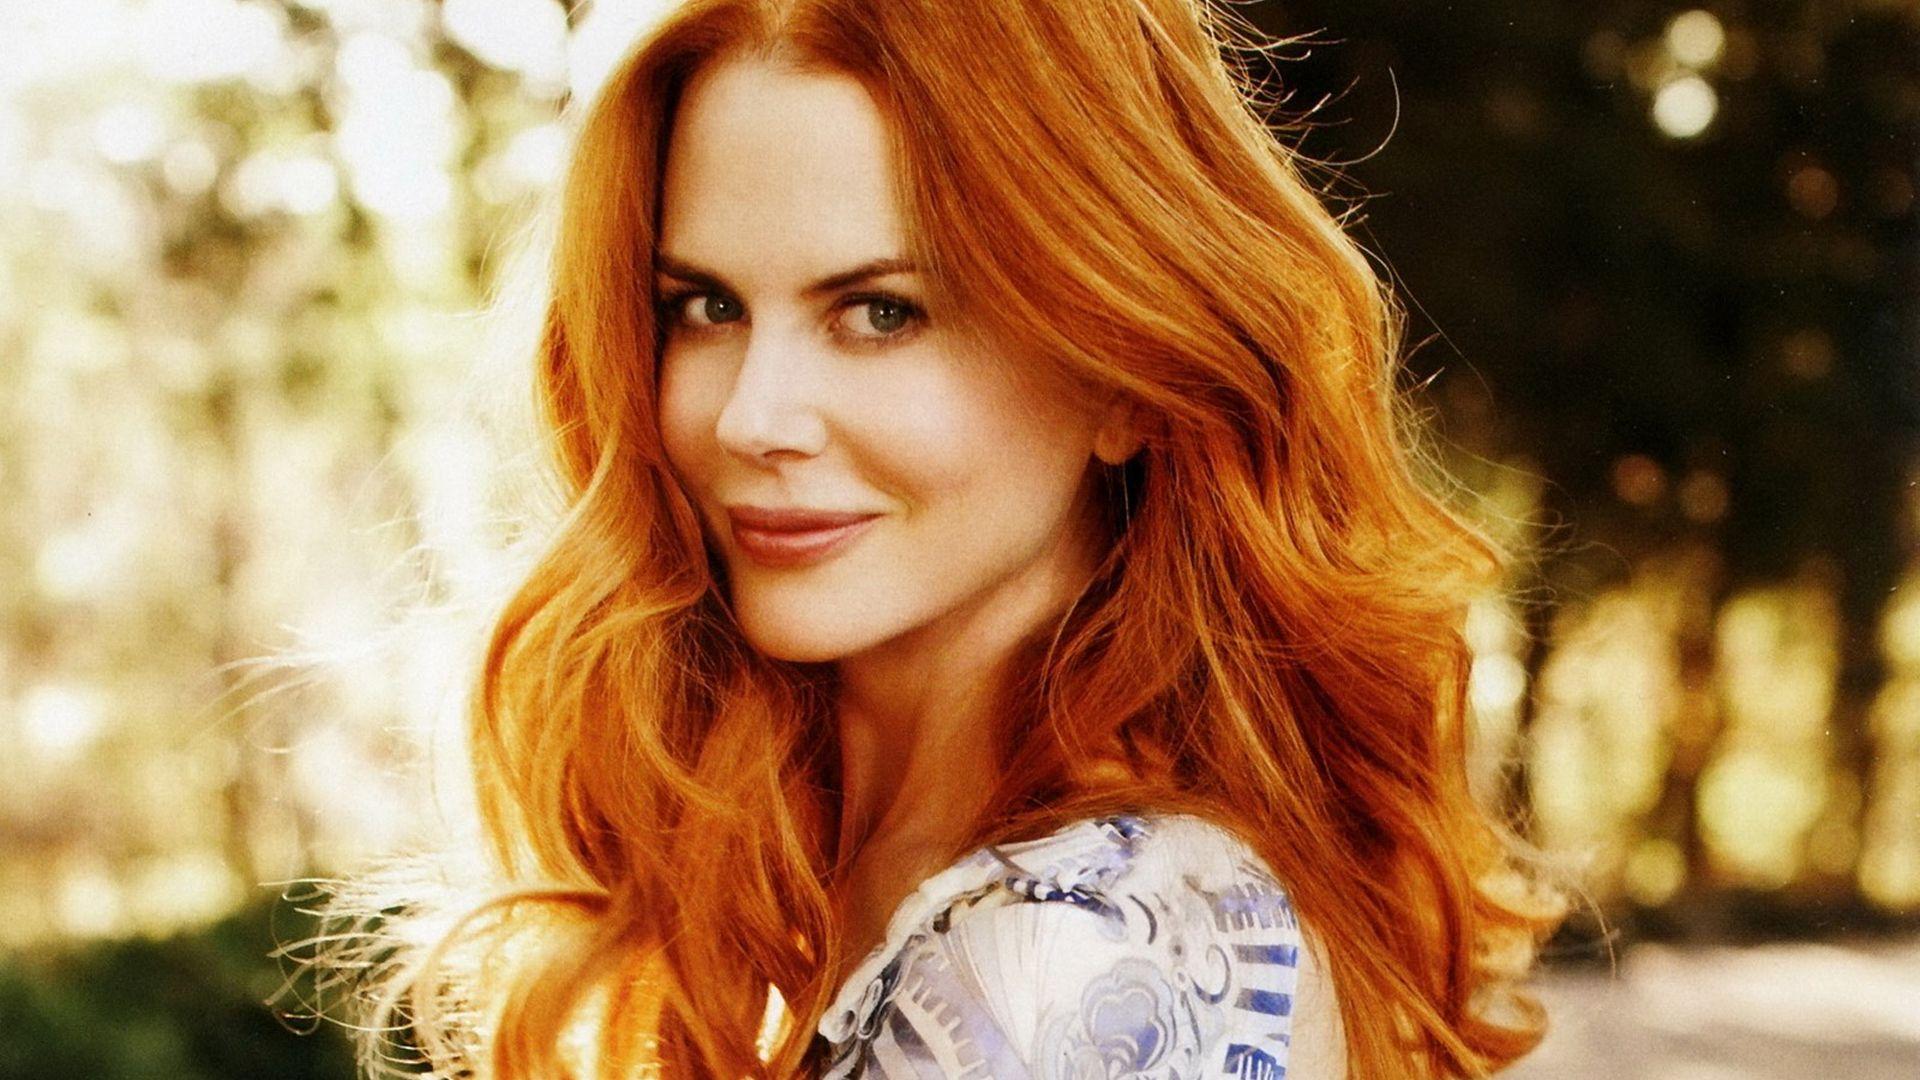 Nicole Kidman 11 داستان های شگفت انگیز از زندگی «نیکول کیدمن»